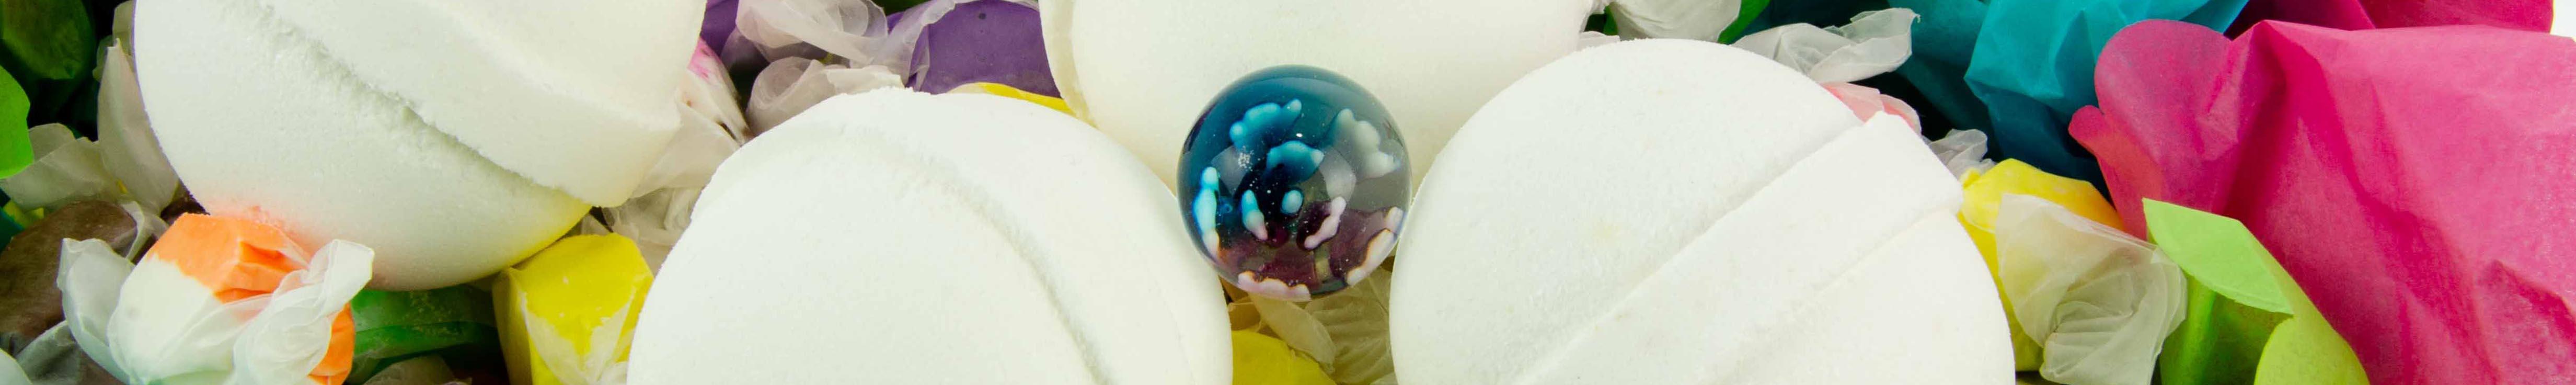 bath-bomb-and-marble-3.jpg